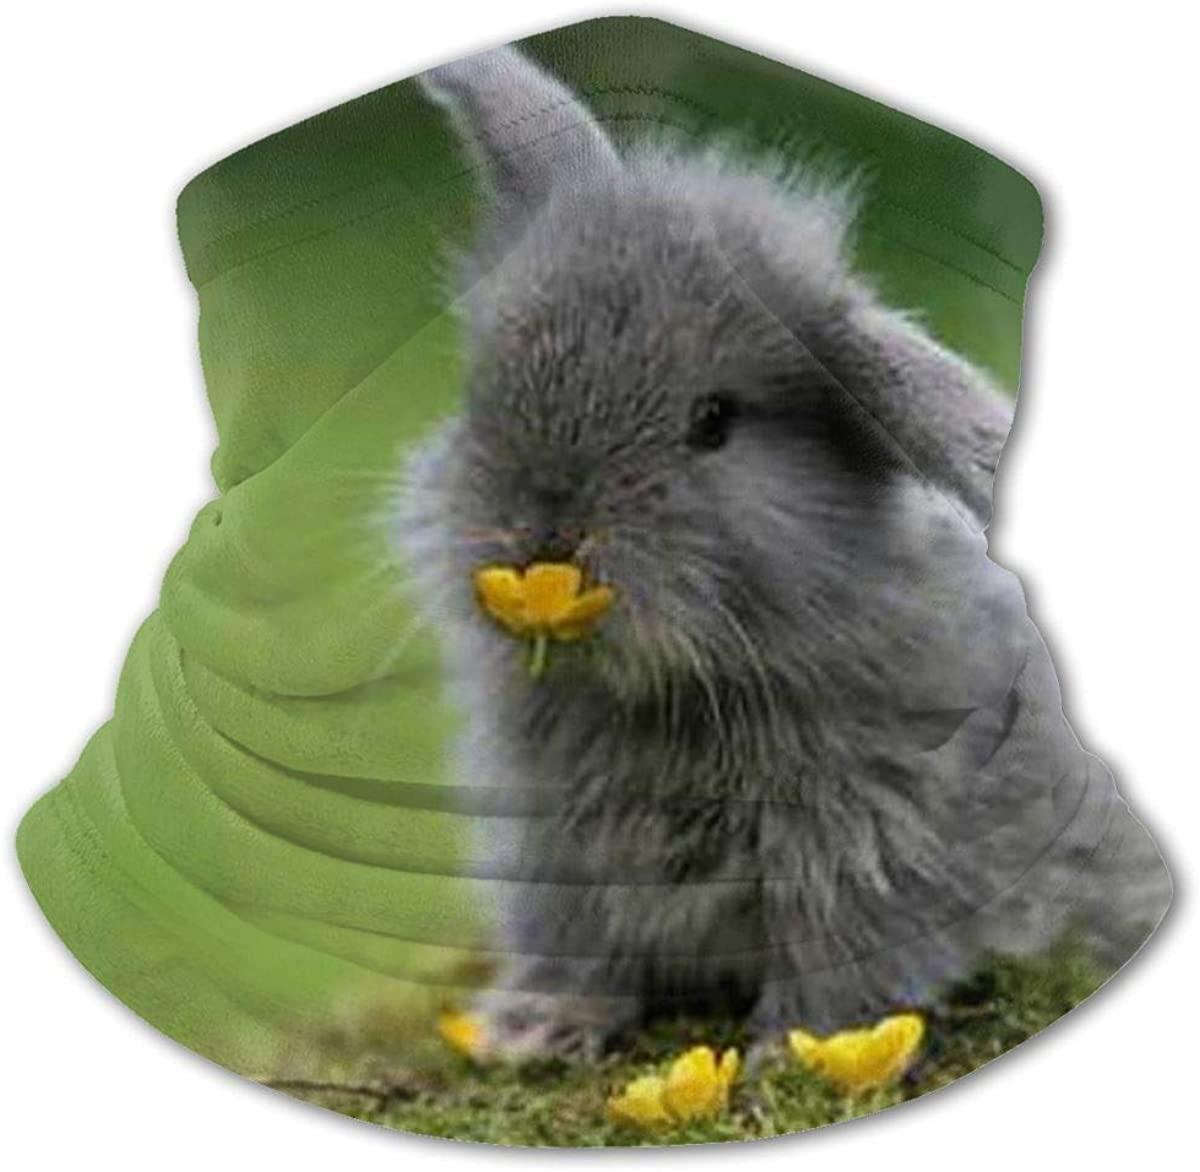 Cute Bunny Eating Flower Headwear For Girls And Boys, Head Wrap, Neck Gaiter, Headband, Tenn Fishing Mask, Magic Scarf, Tube Mask, Face Bandana Mask For Camping Running Cycling